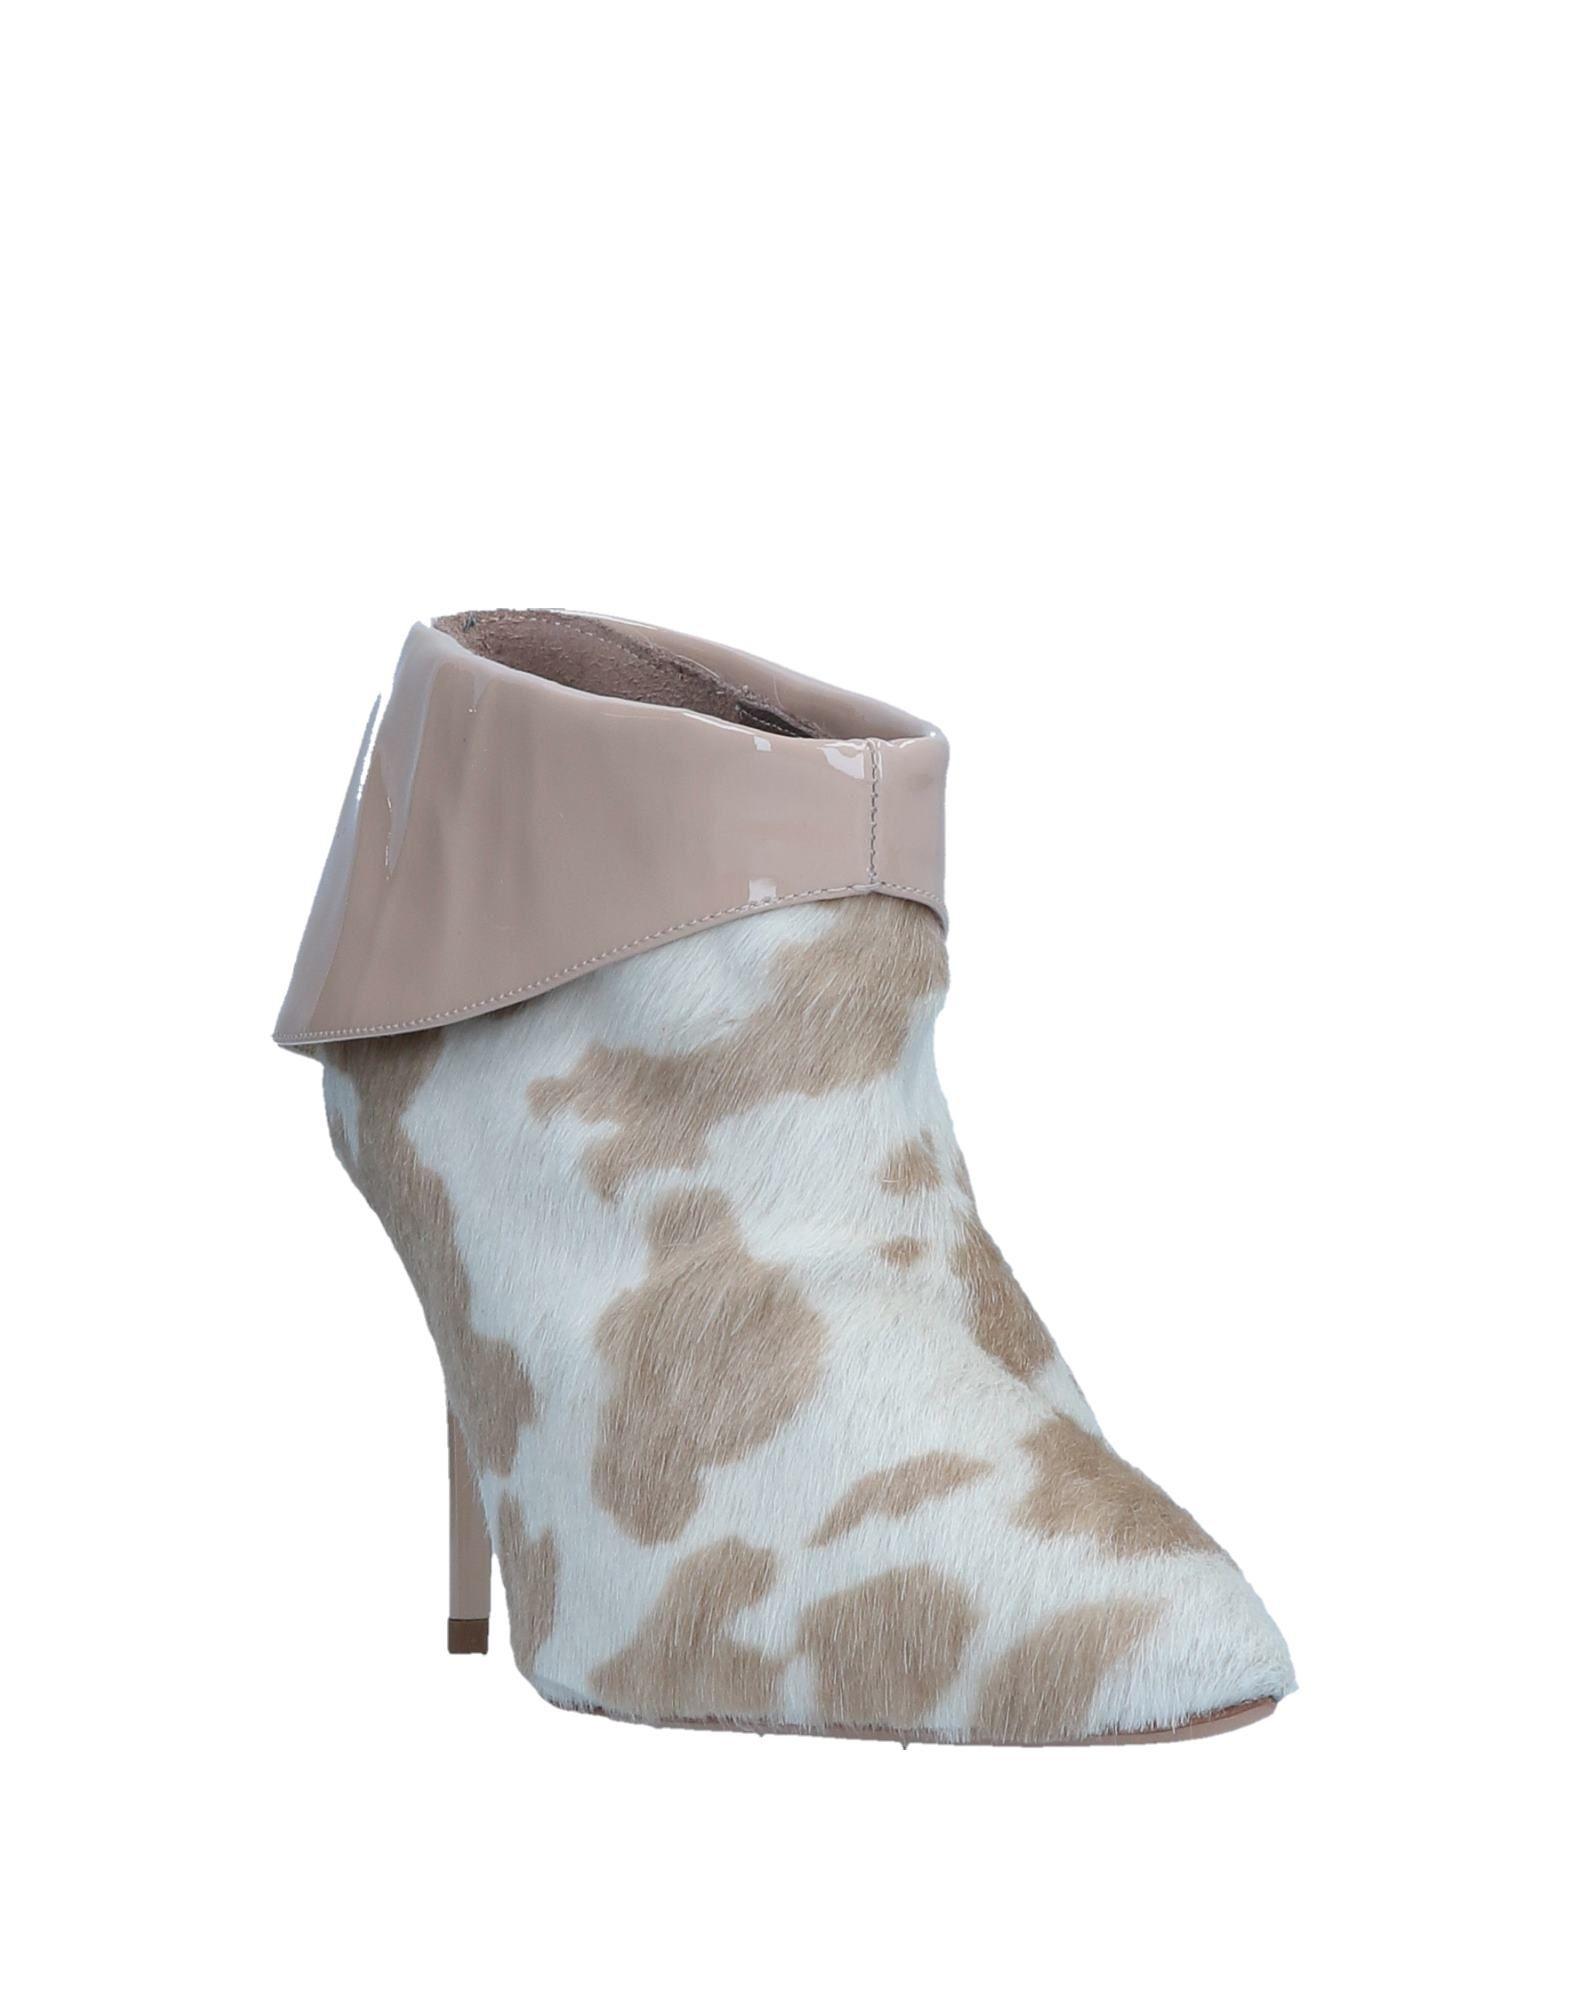 Icône Stiefelette Damen  11521667SLGut aussehende strapazierfähige strapazierfähige strapazierfähige Schuhe df5b7e